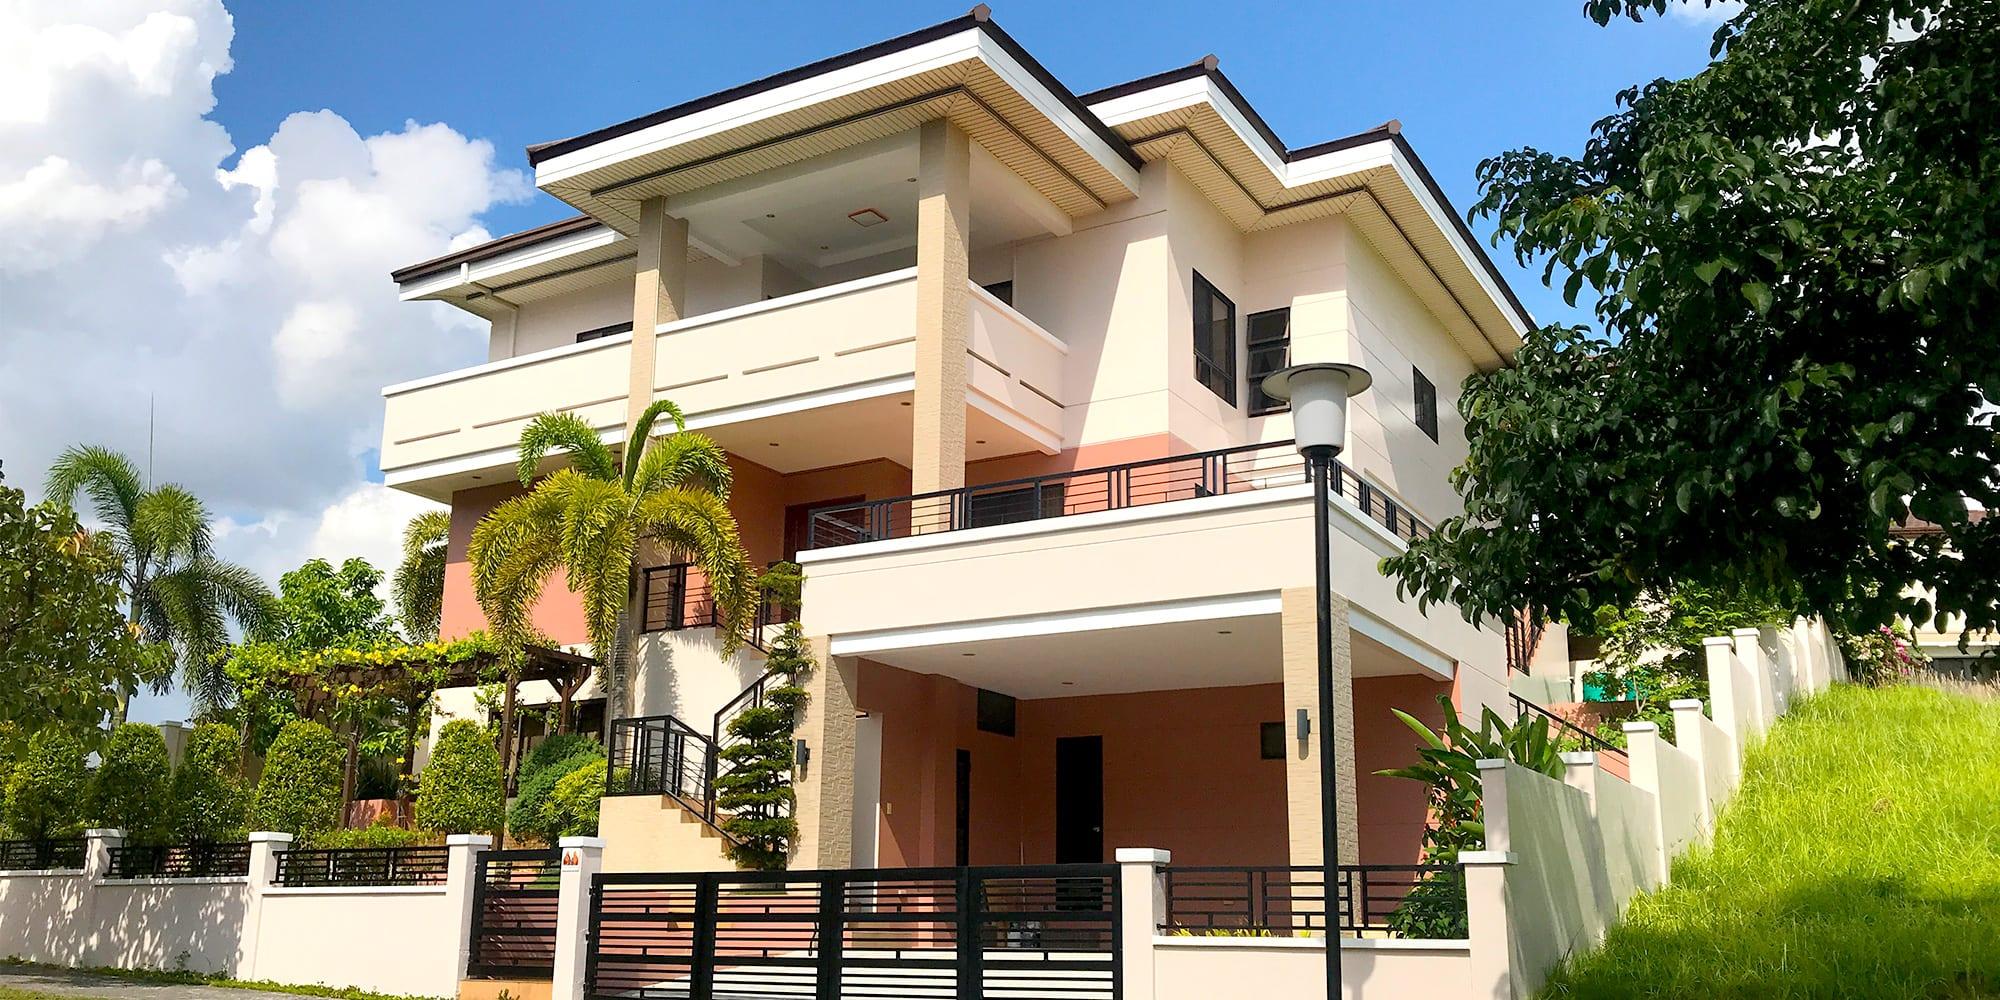 Pristina North House For Sale in Talamban, Cebu City